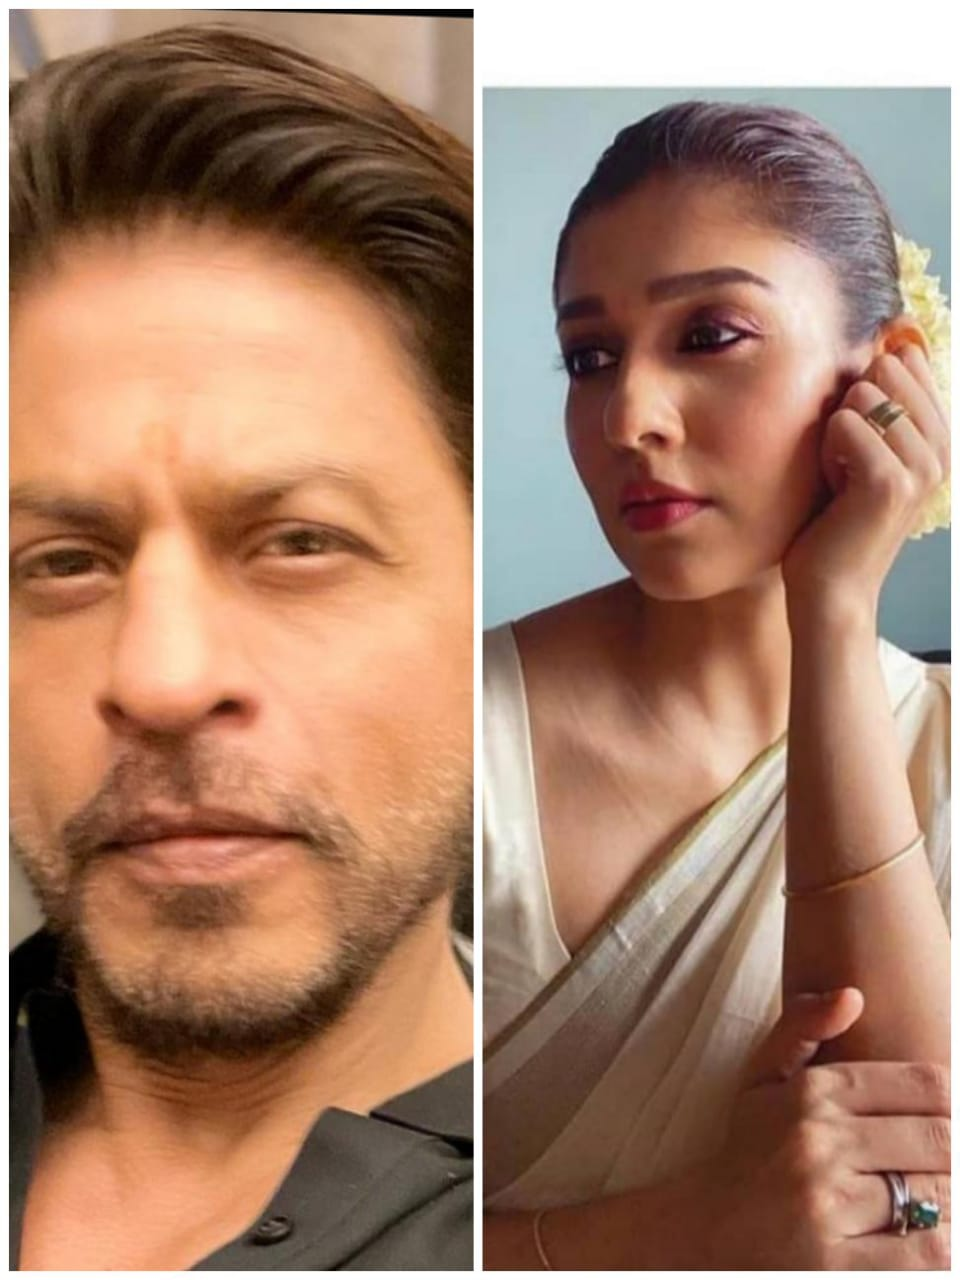 South Indian star Nayanthara to make her Bollywood debut with Shah Rukh Khan